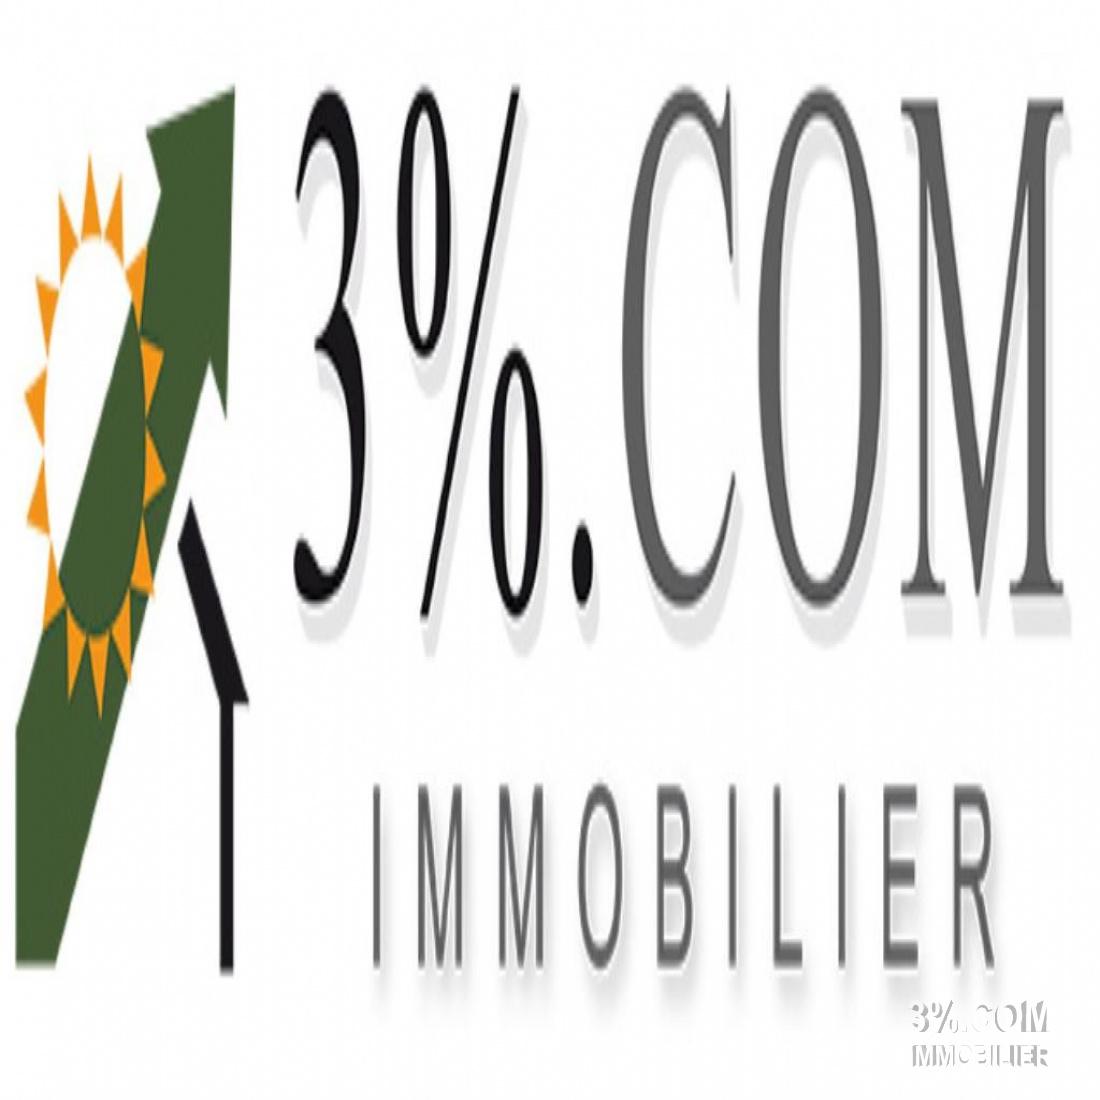 Logo-3pourcent-2014mini